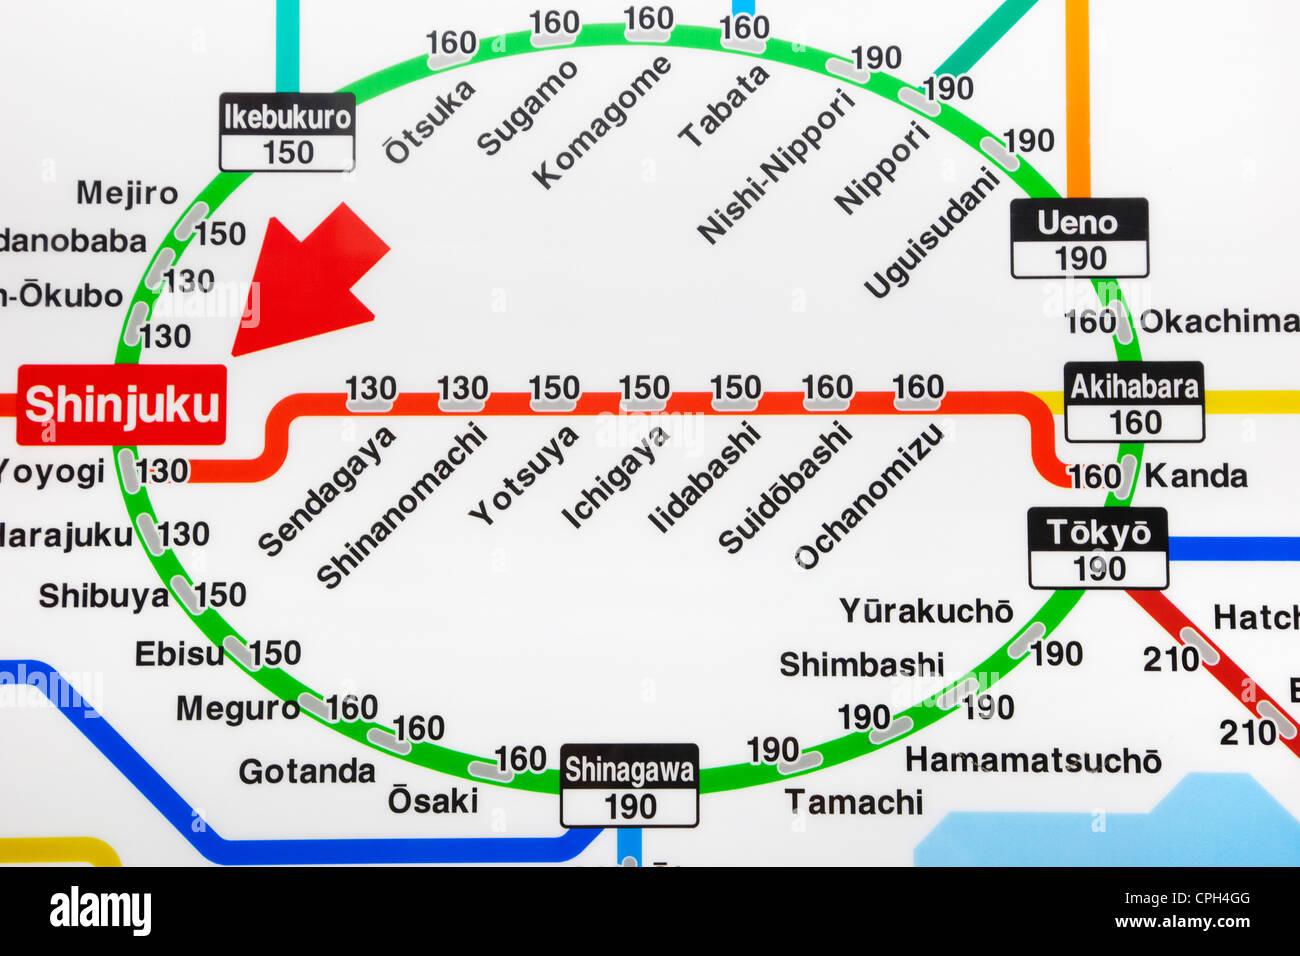 Asia Japan Tokyo Train Map Tokyo Railway Map Jr Japan Railways